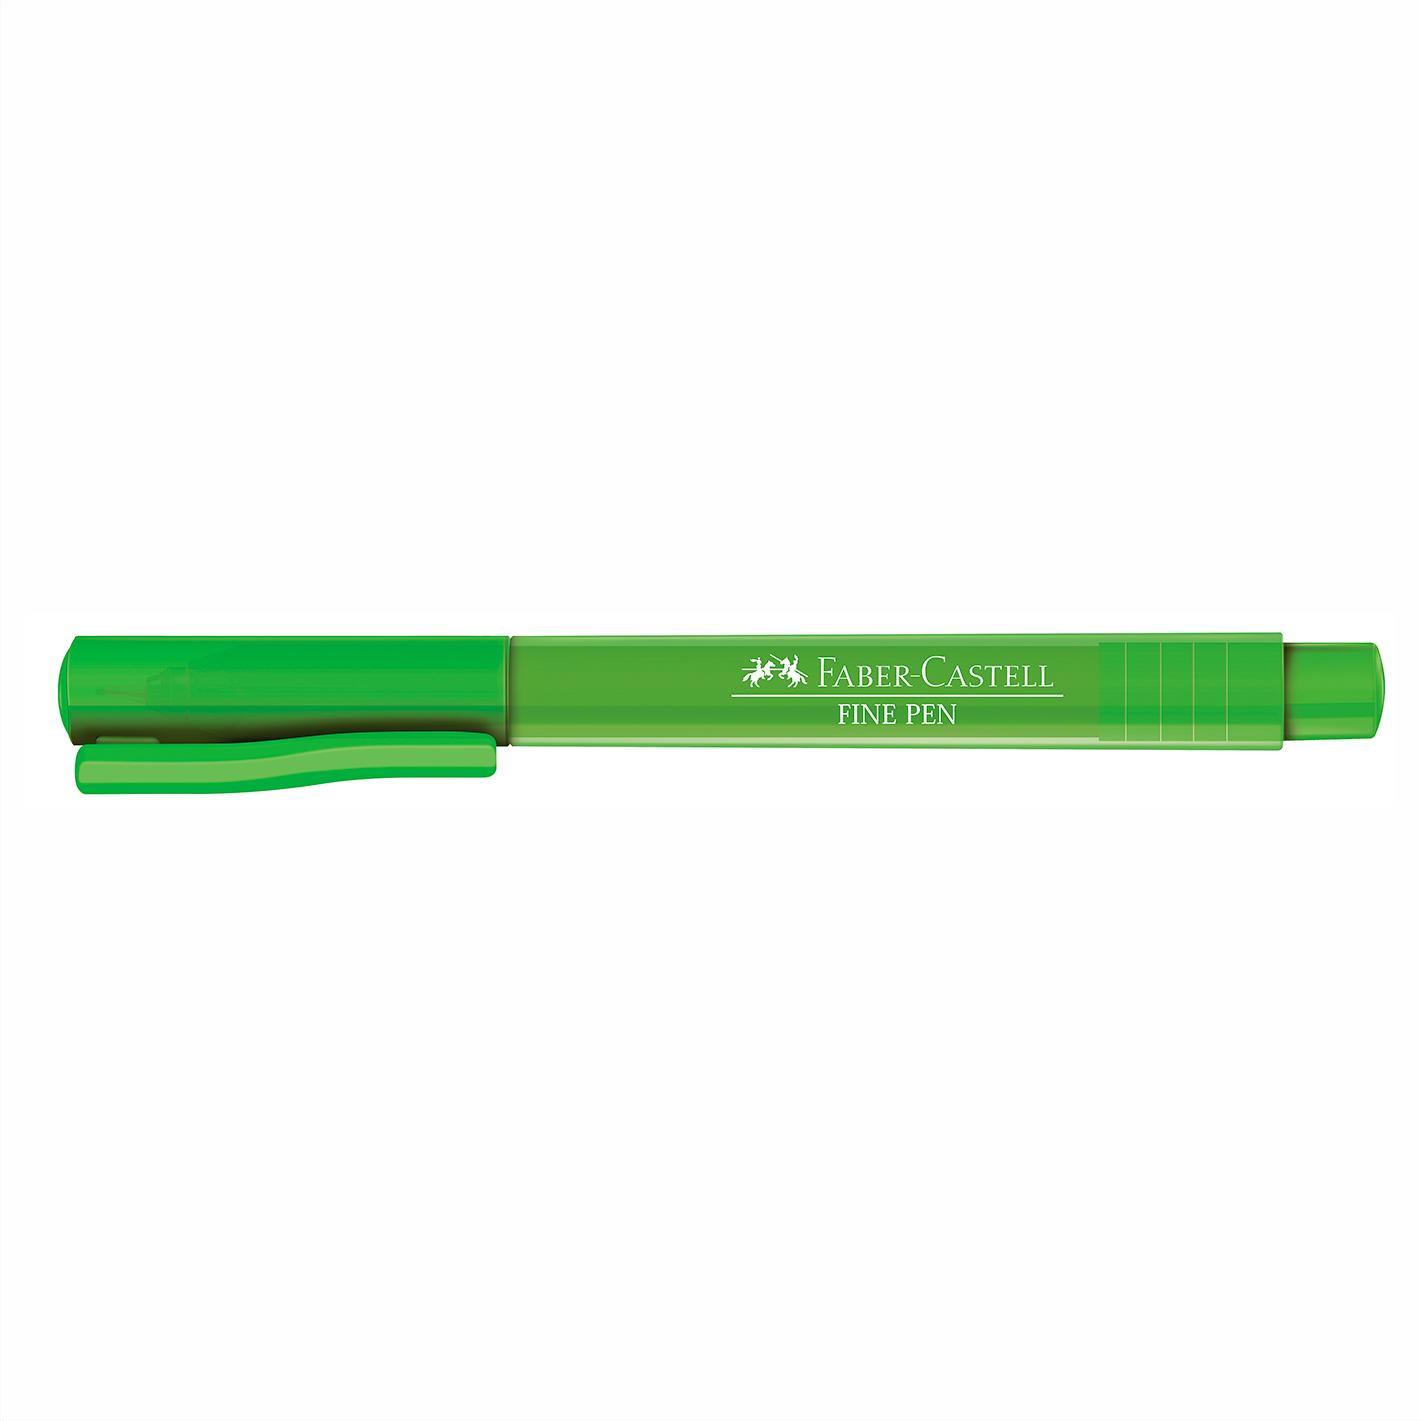 Caneta Hidrográfica 0.4 verde folha FINE PEN Faber-Castell